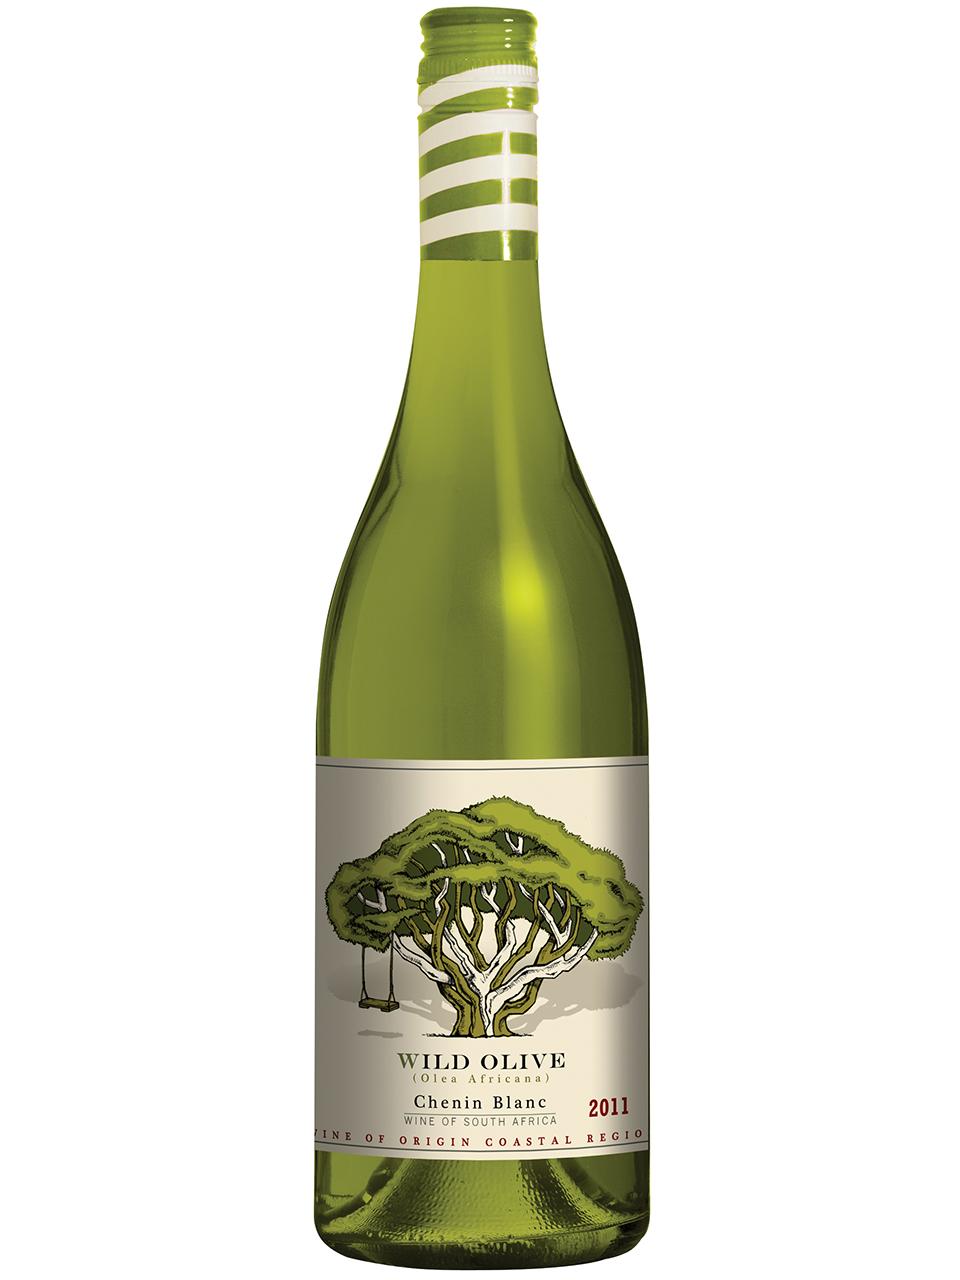 The Wild Olive Old Vines Chenin Blanc